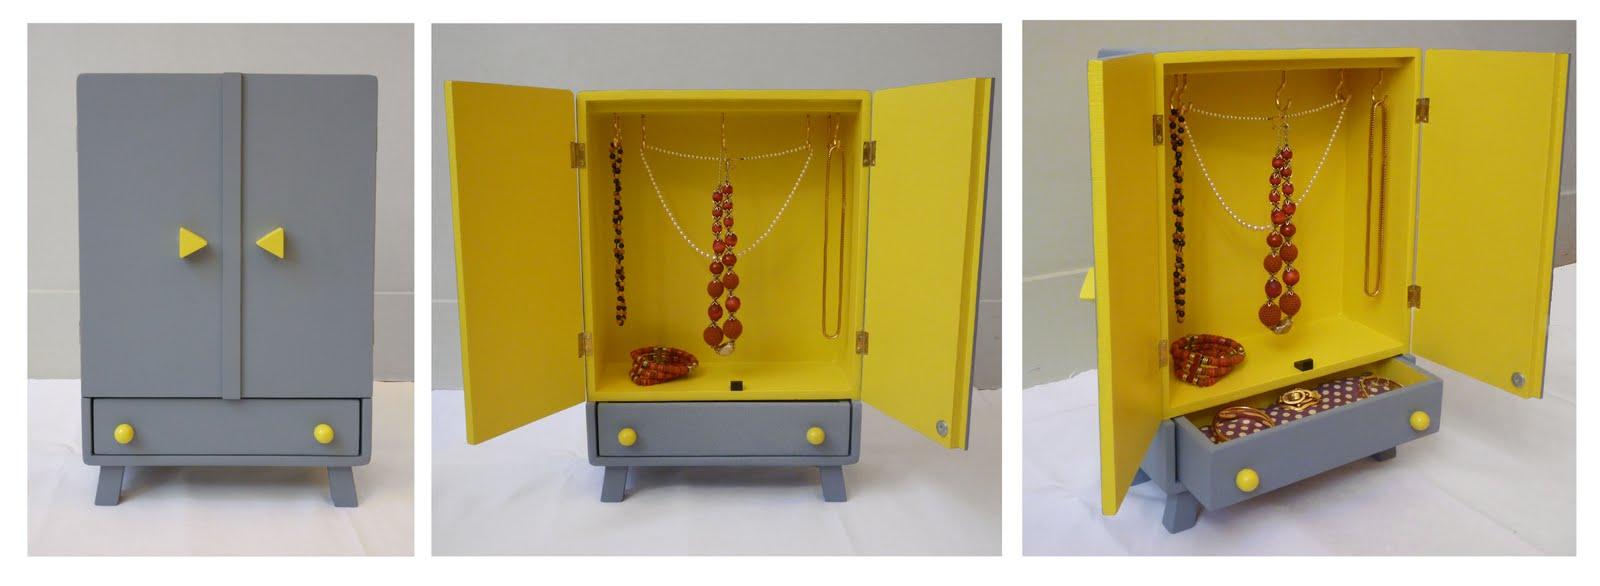 mini armoire full image for mini kitchen armoire image of alera wardrobe storage wall mount. Black Bedroom Furniture Sets. Home Design Ideas